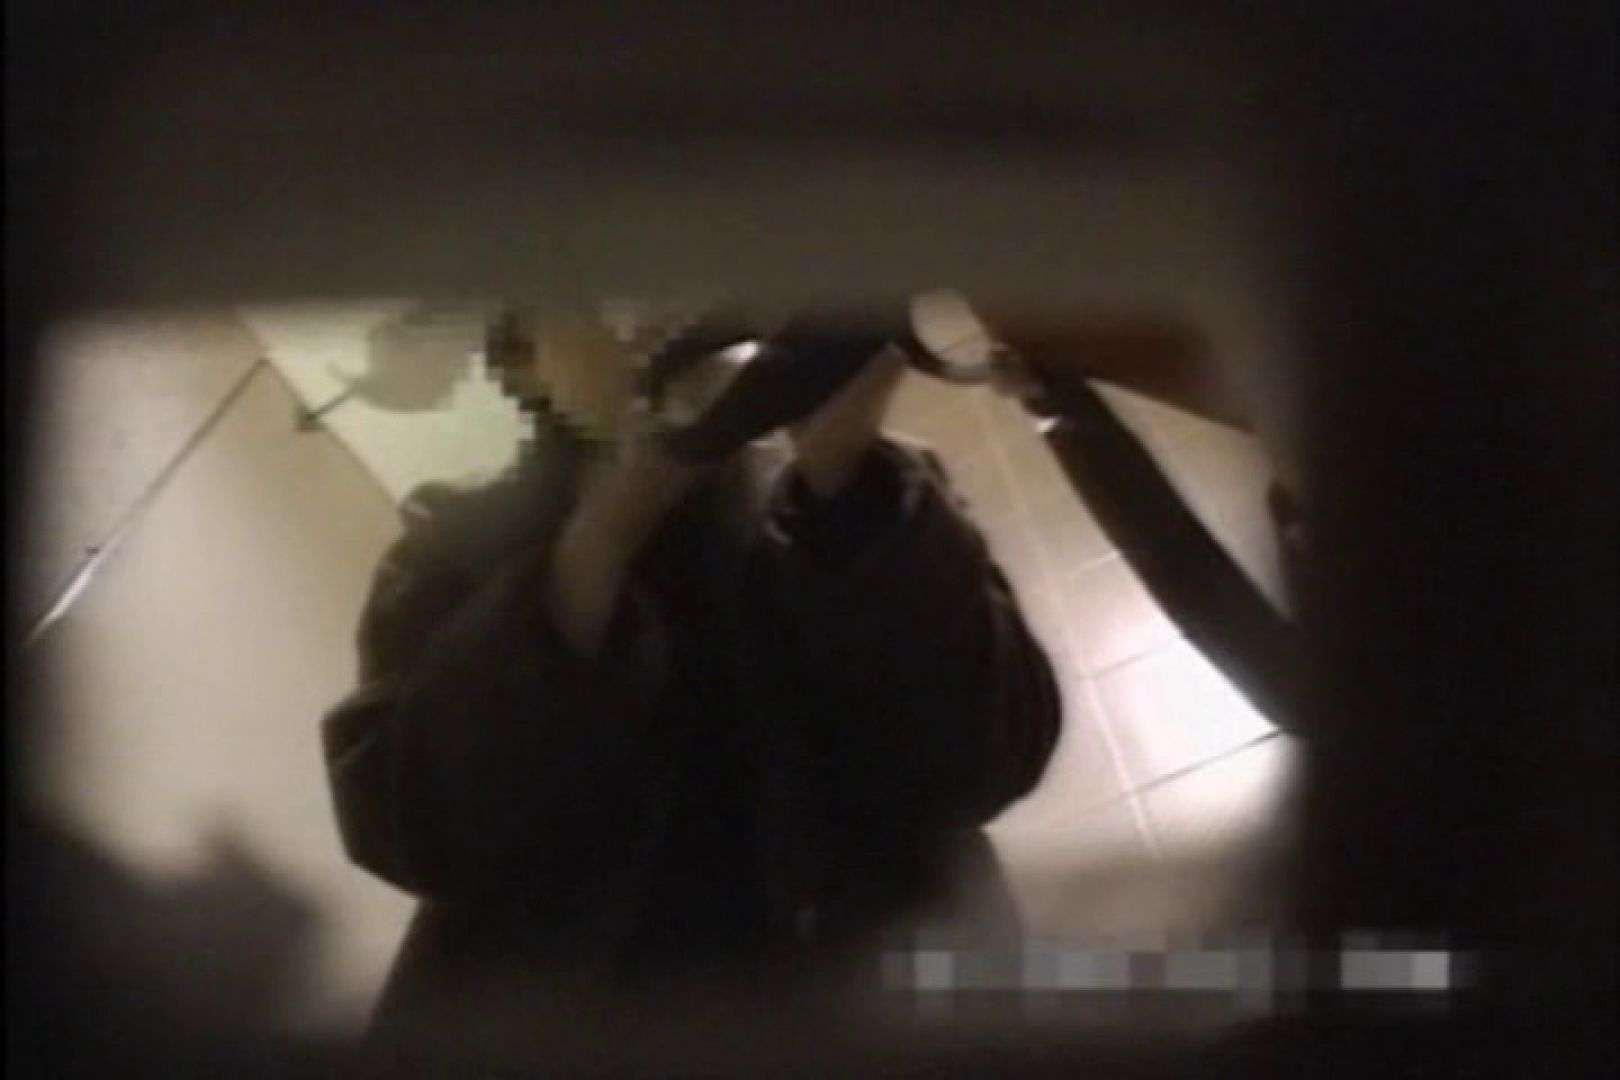 STY-013 実録!2カメde女子洗面所 洗面所 盗み撮り動画 113pic 97